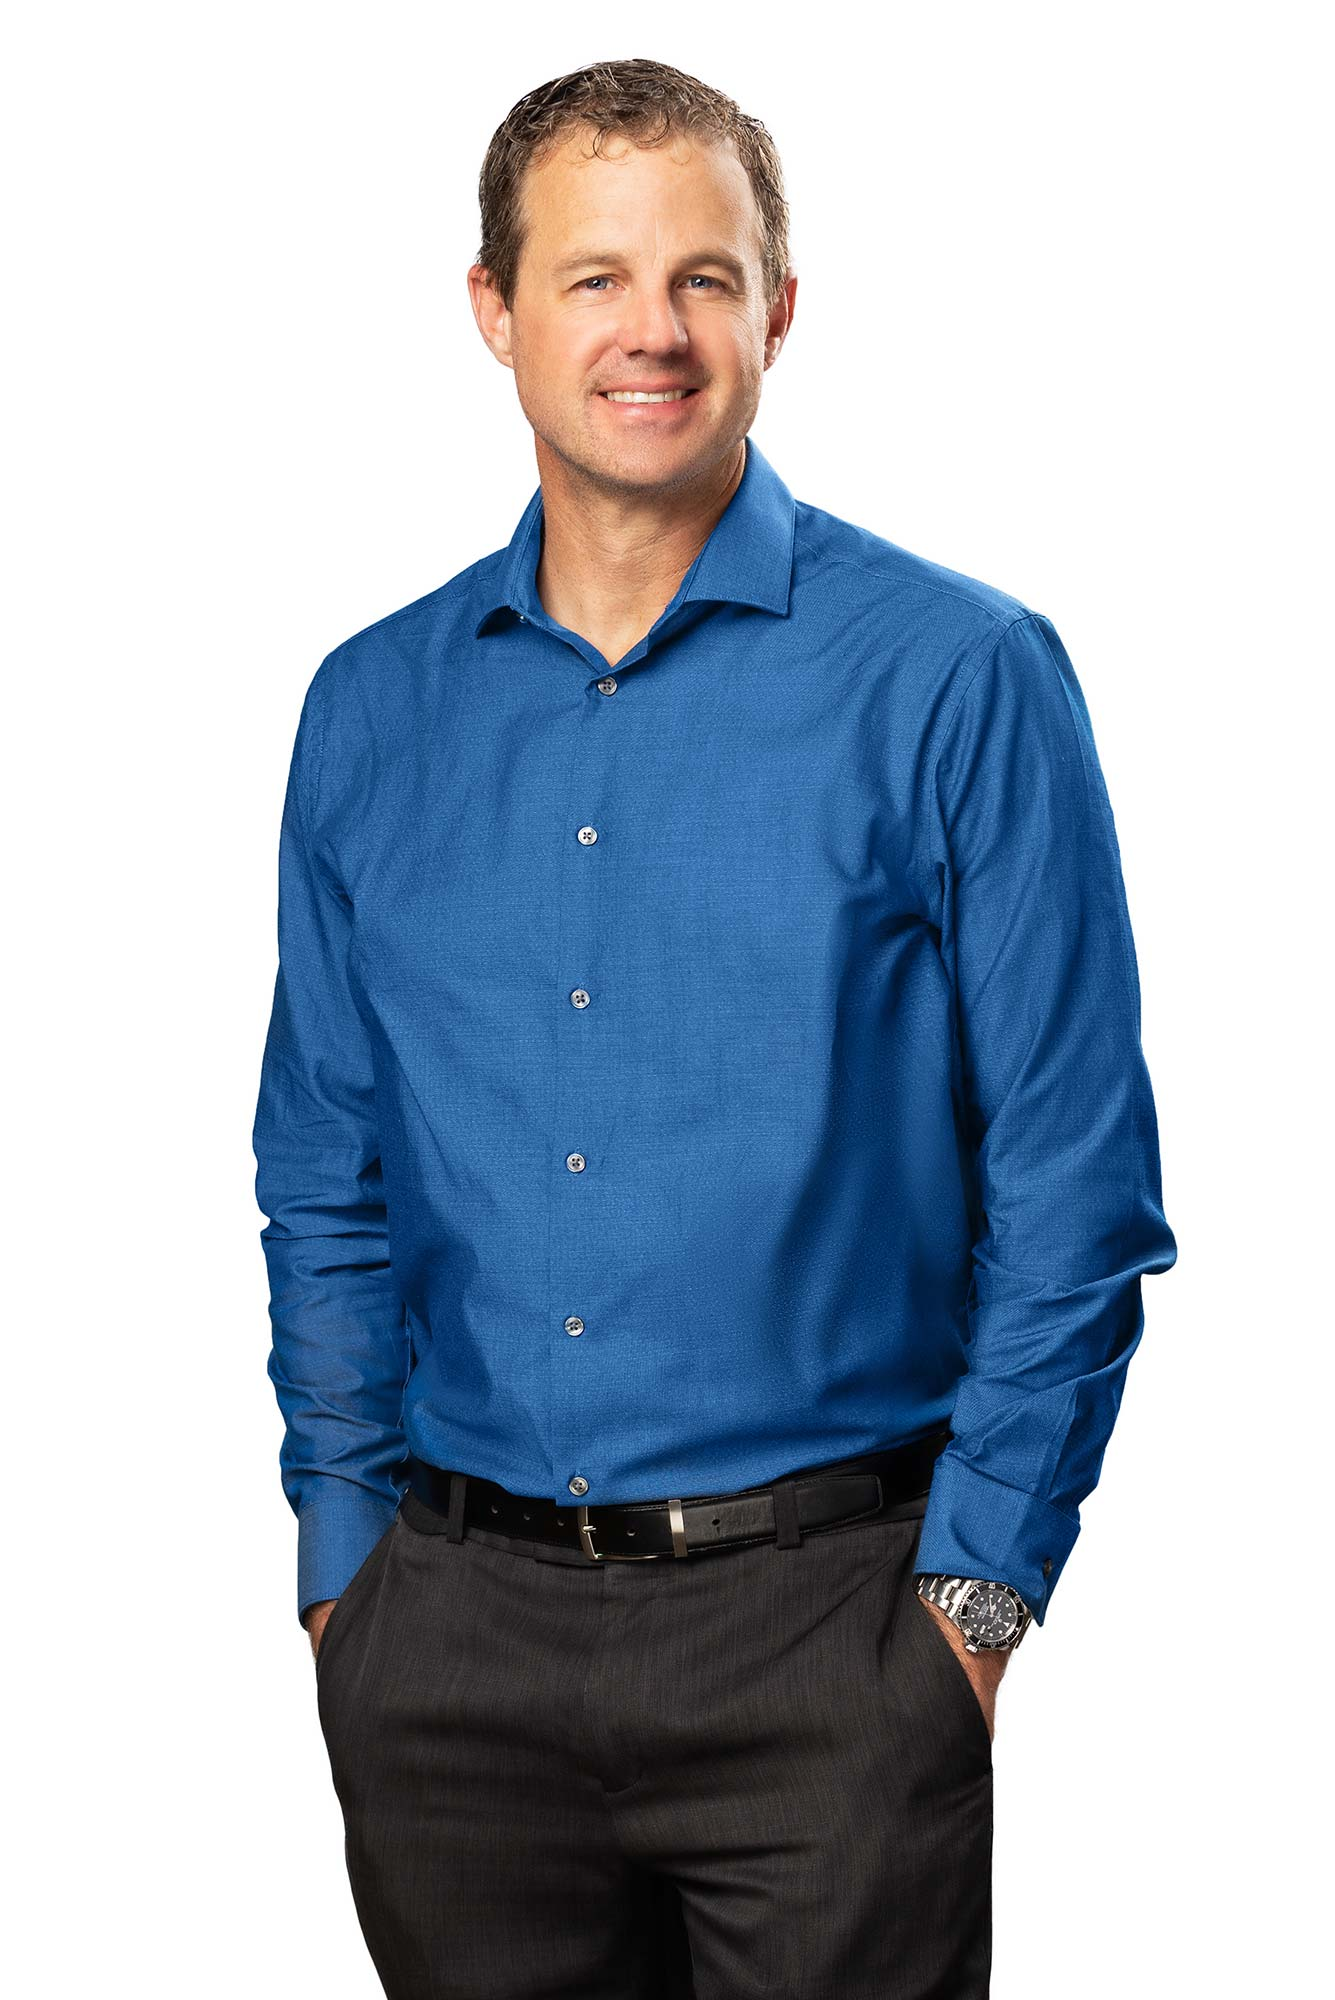 Chris Harper PE, SE Senior Project Manager Phoenix Office Schaefer